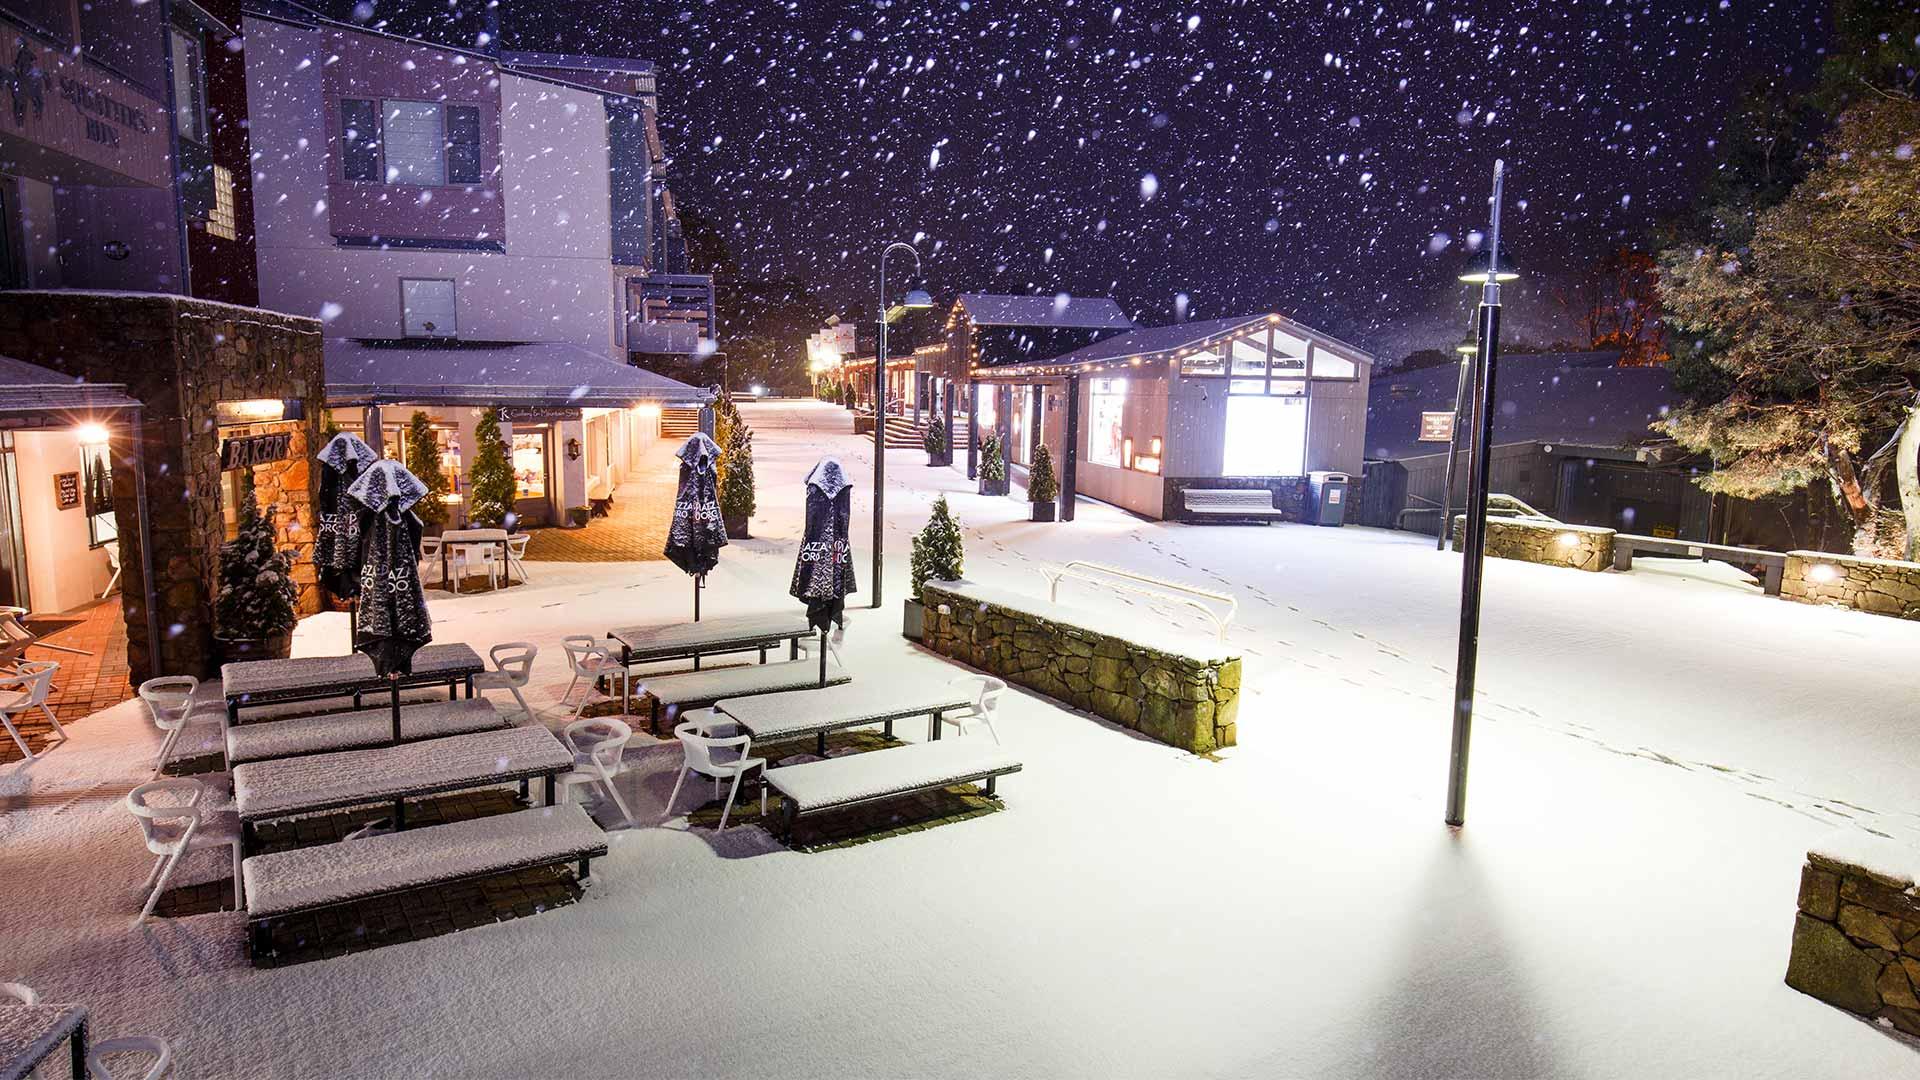 Watch Step Inside Australias Most Luxurious Ski Lodge video